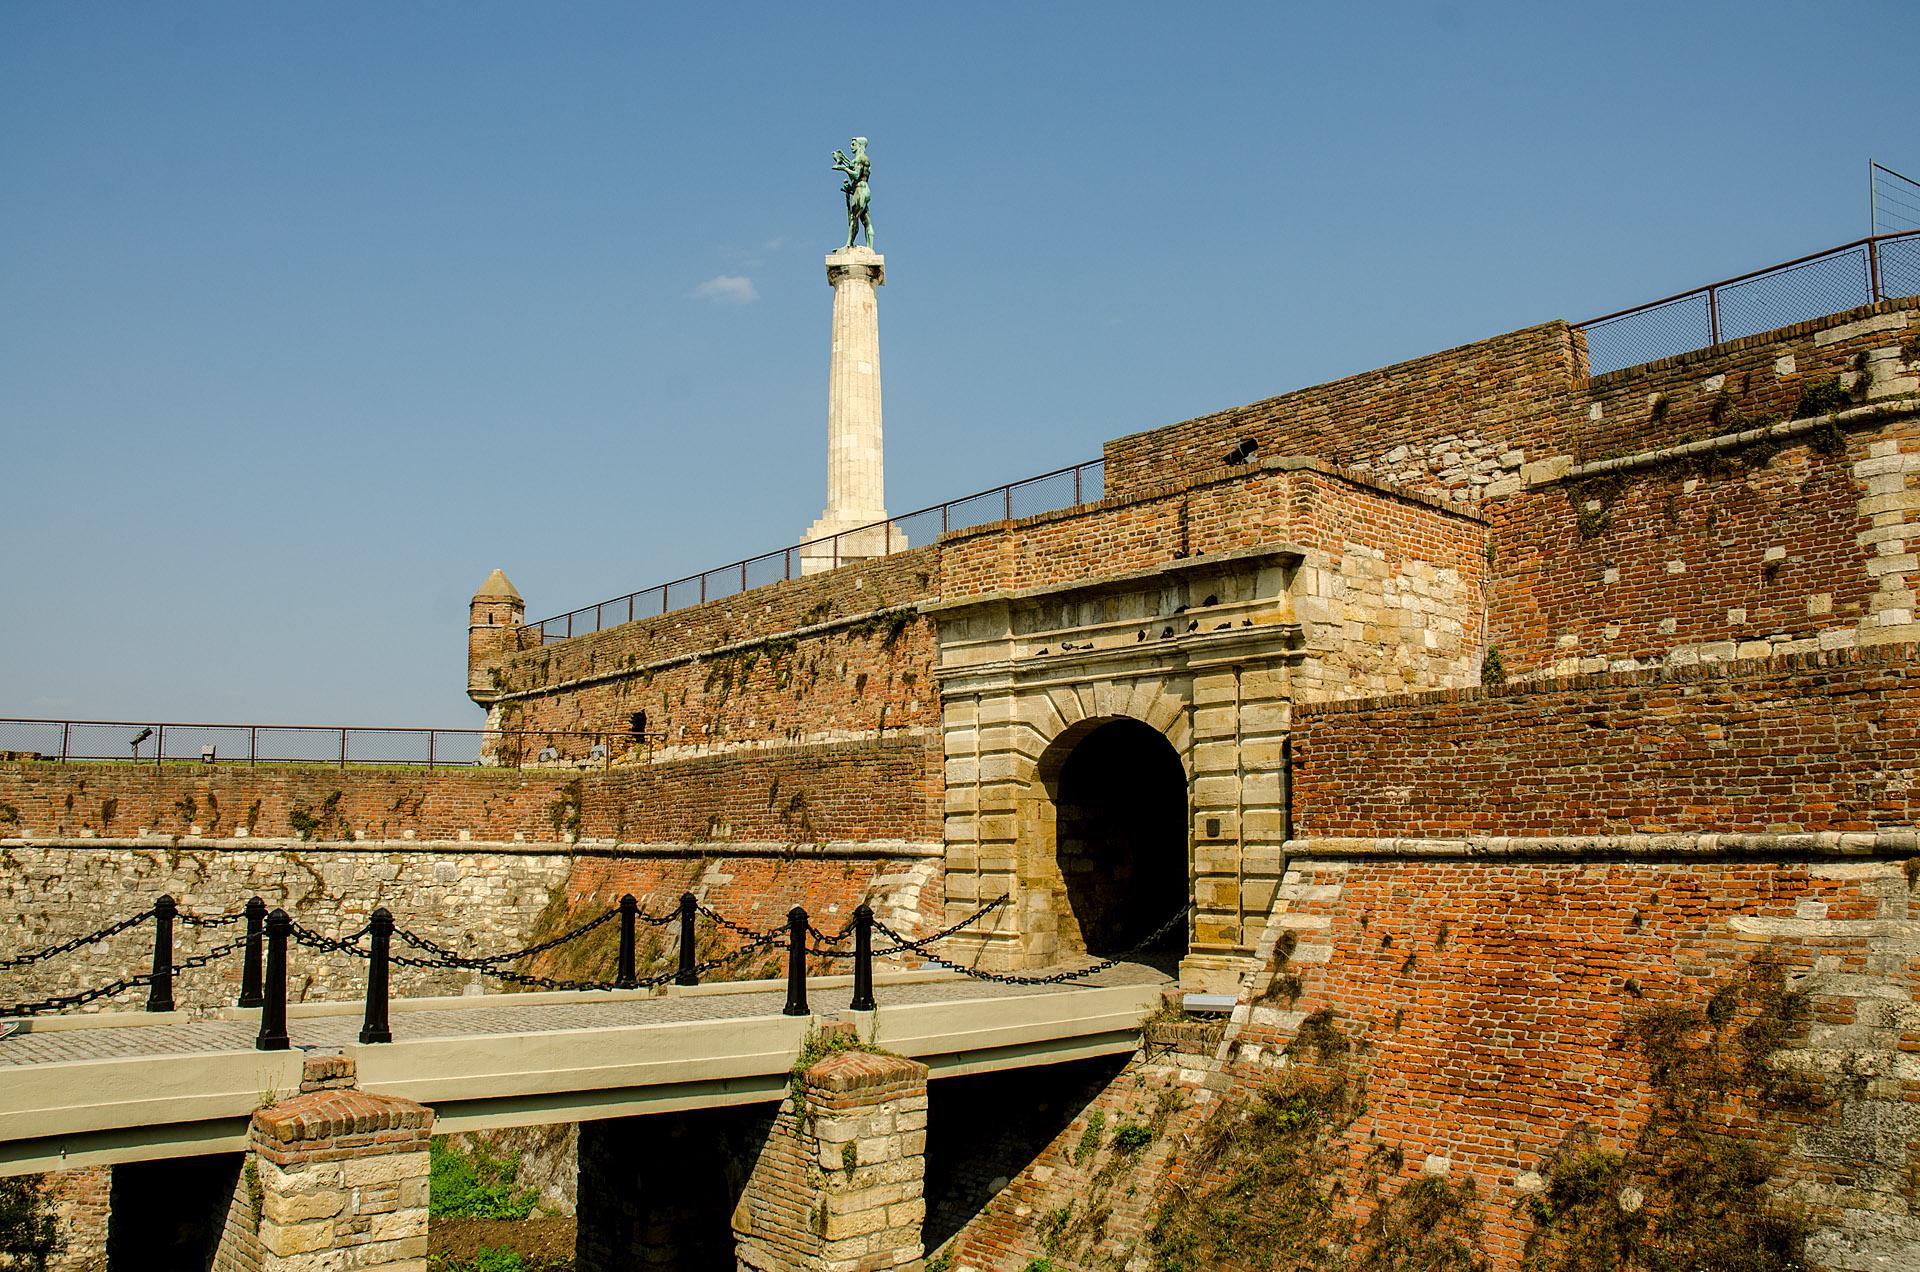 Pobednik ('The Victor' monument)